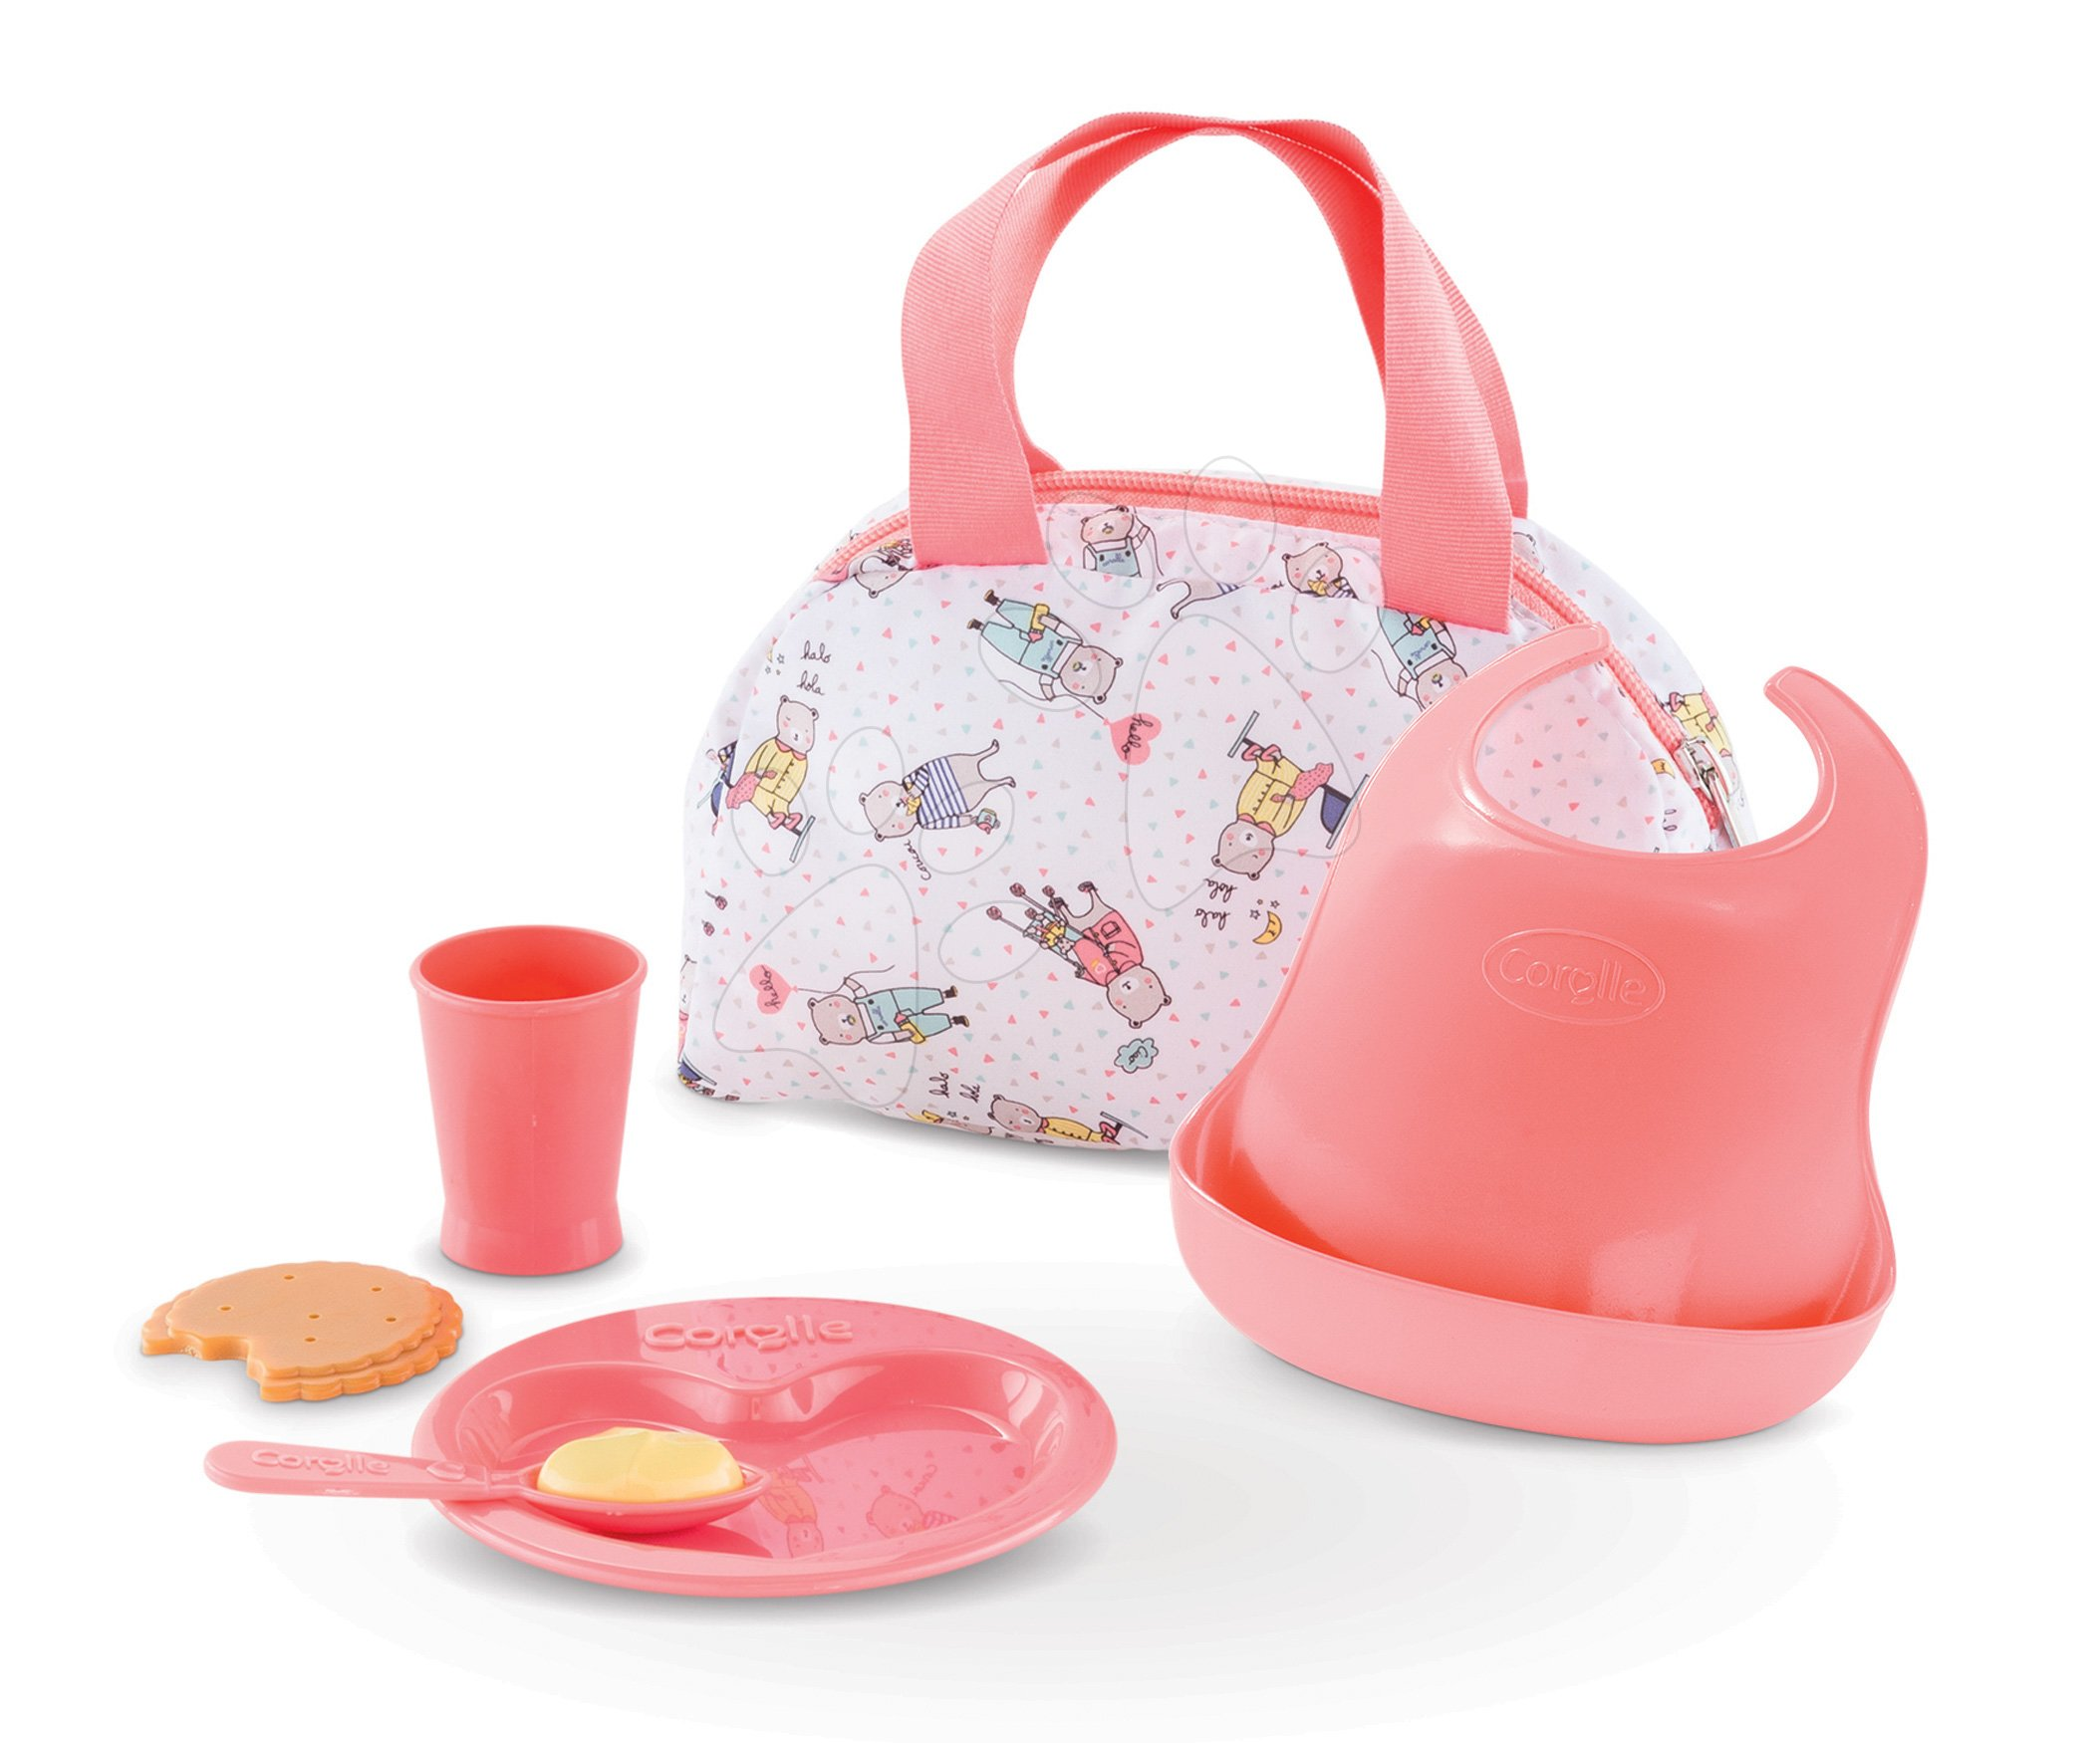 Obedová súprava s taškou Mealtime set Mon Grand Poupon Corolle pre 36-42 cm bábiku od 24 mes